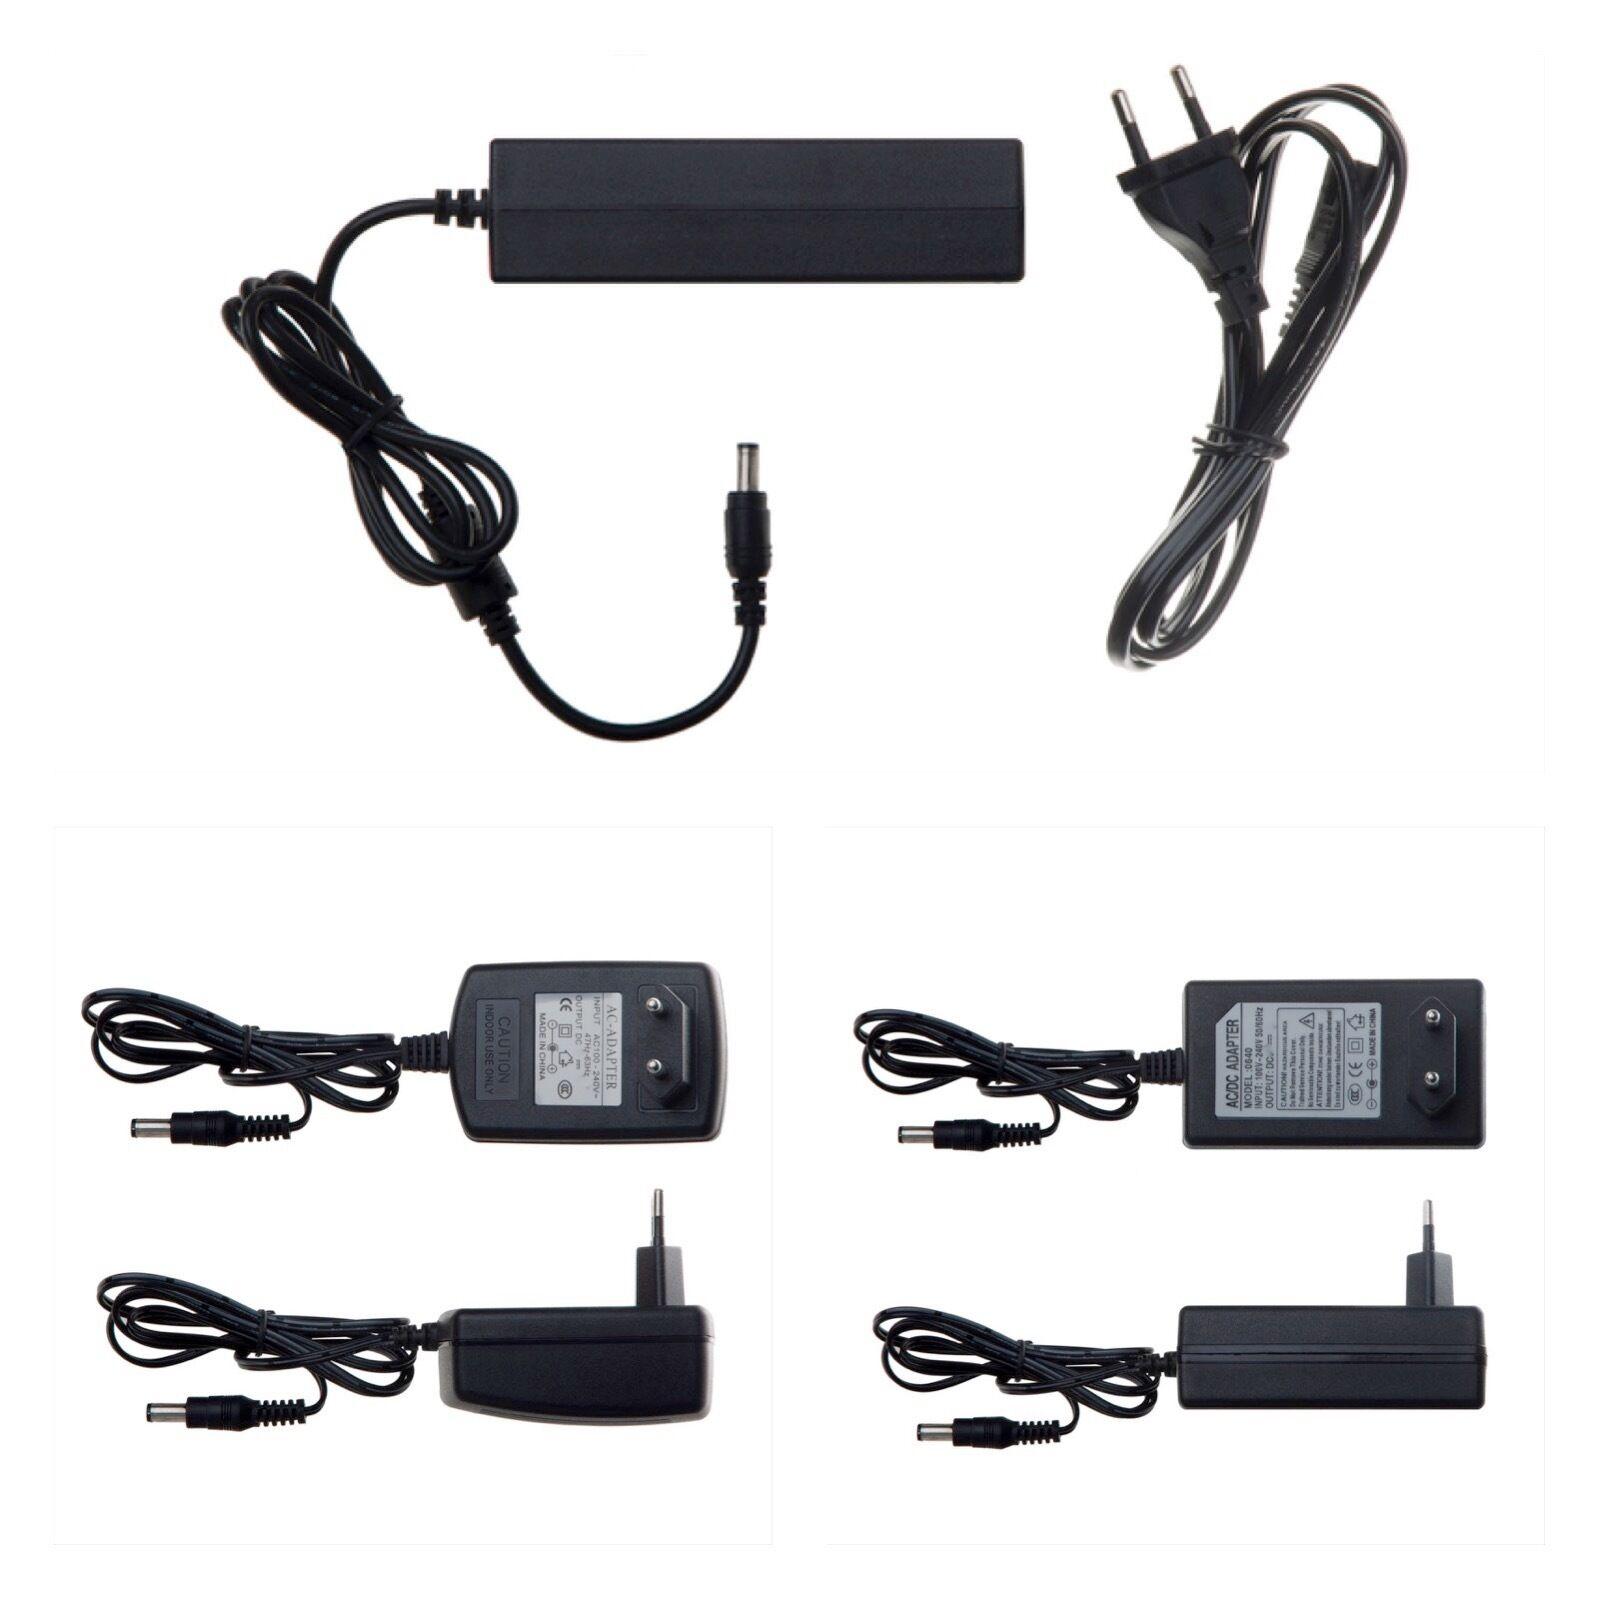 12V AC AC Netzteil WECHSELSPANNUNG✔ 500mA 1000mA 5,5mm Stecker